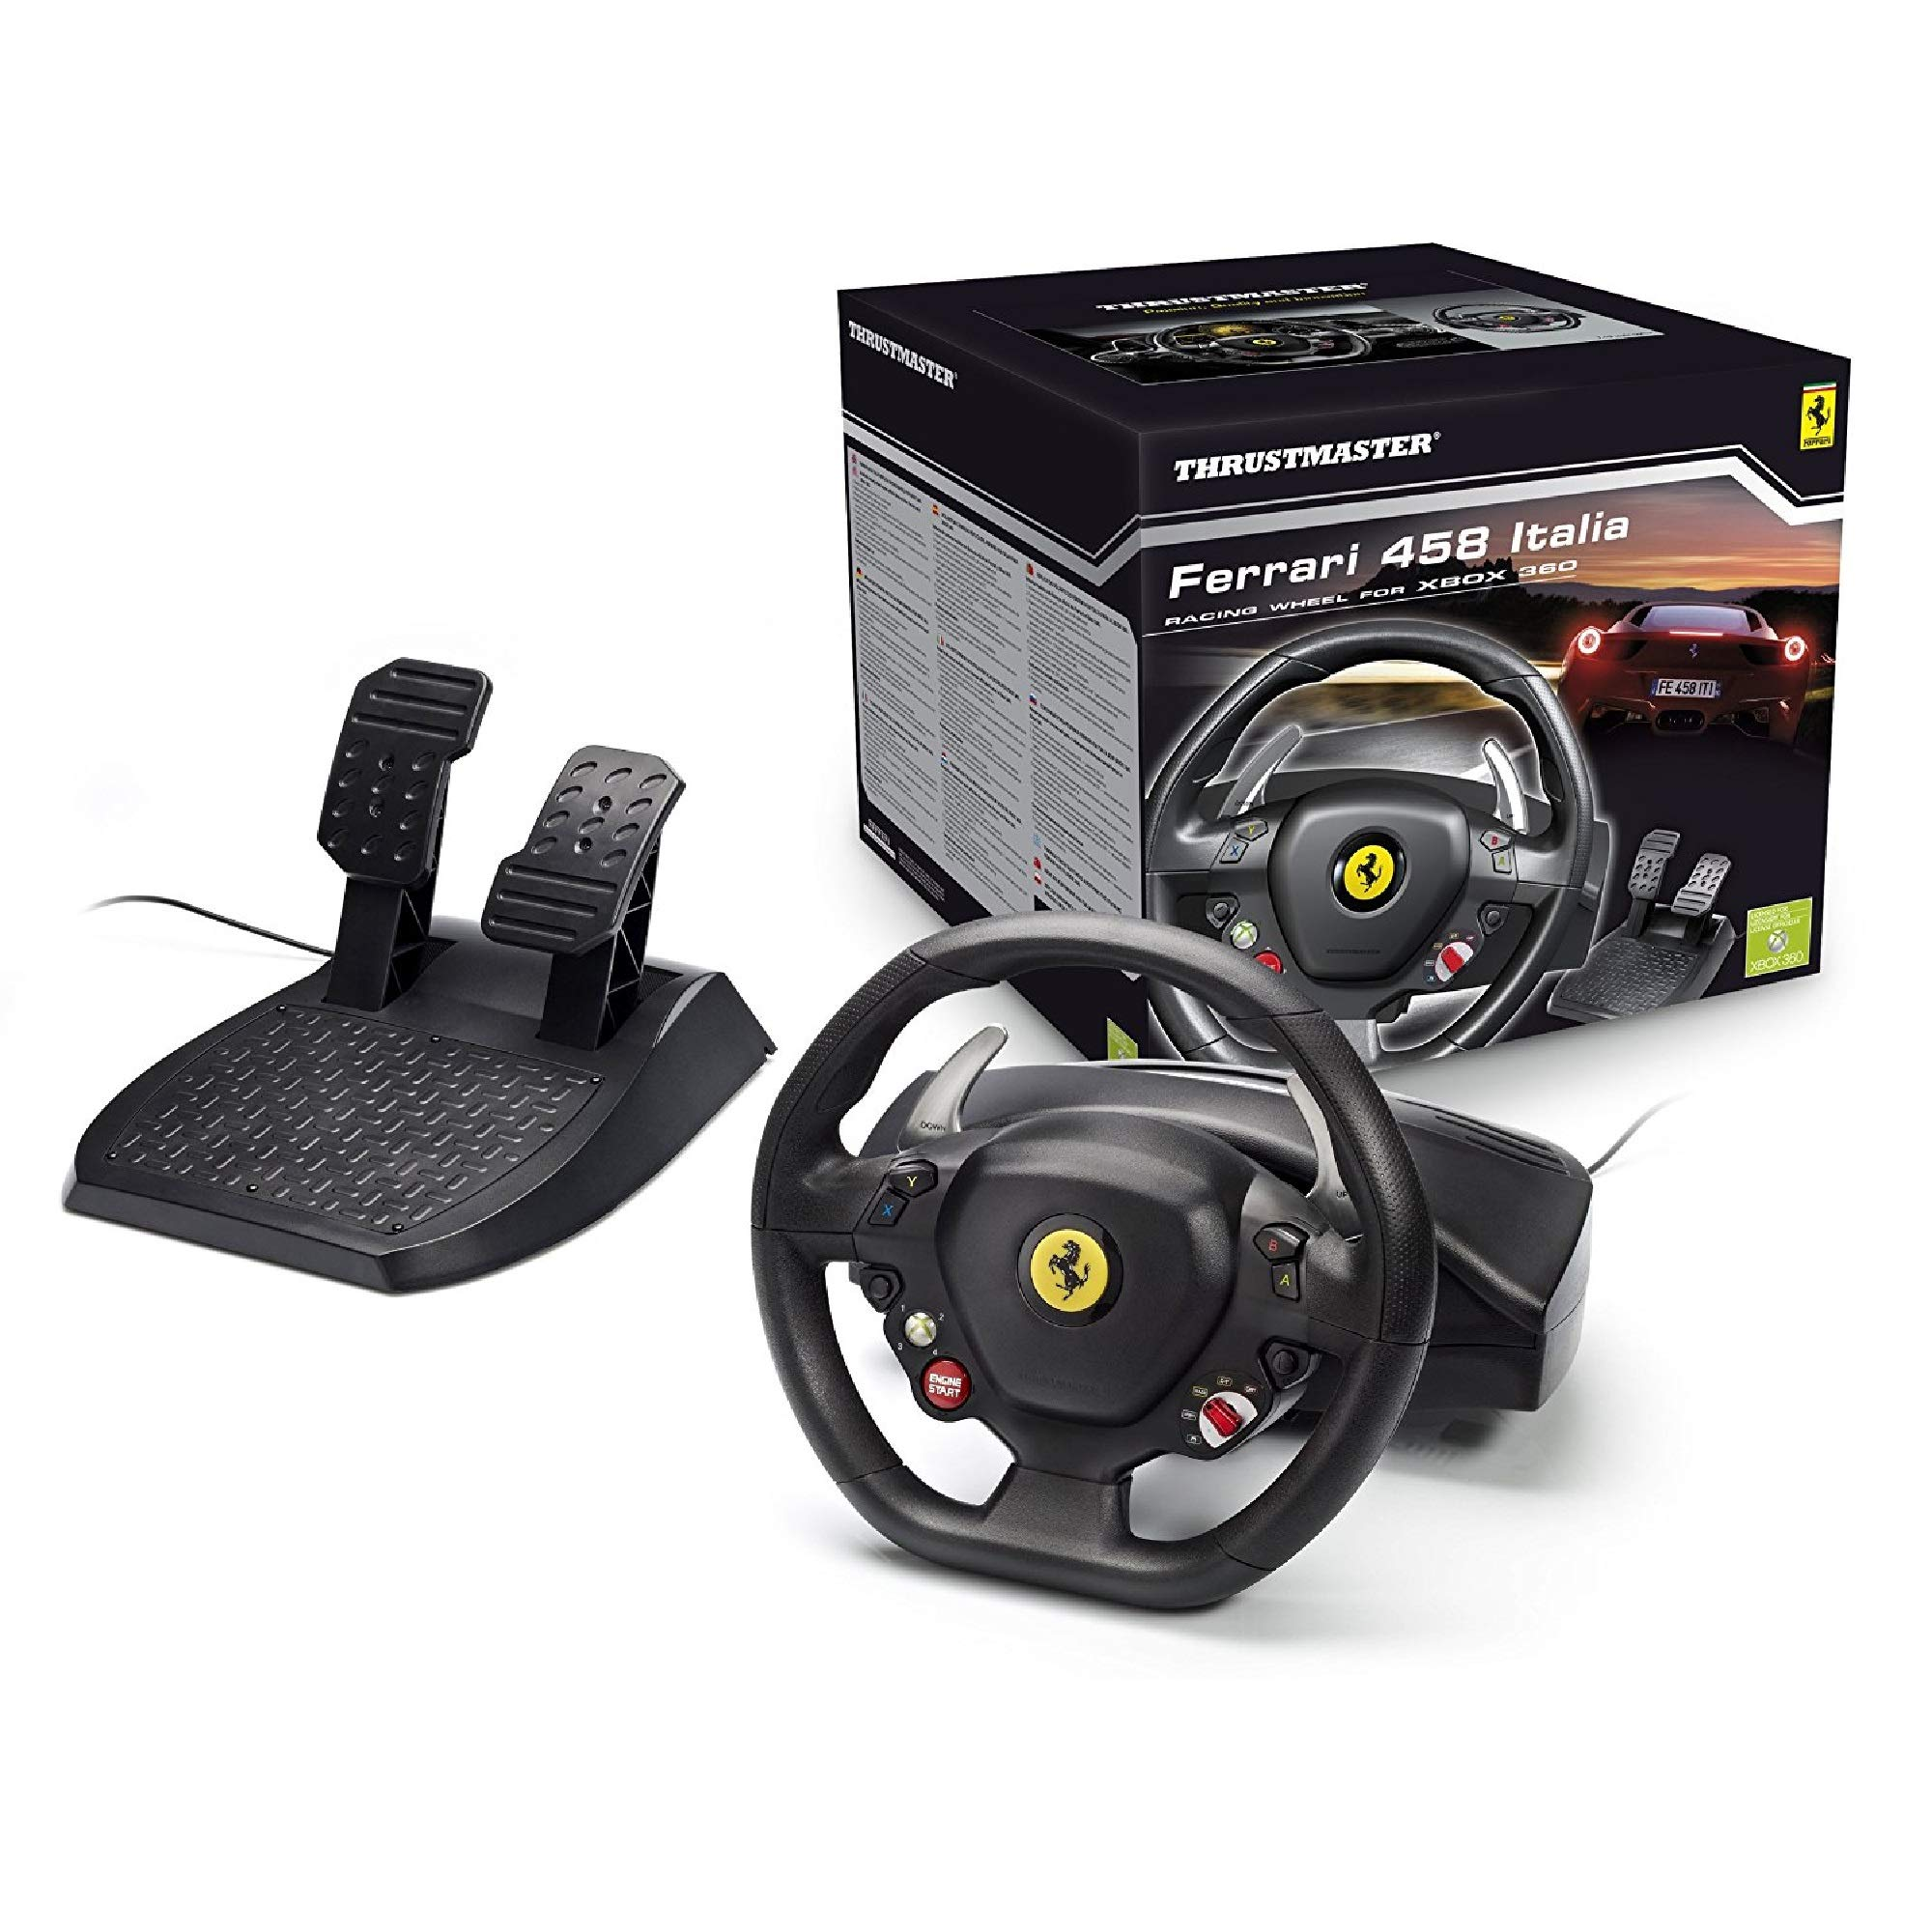 Thrustmaster FERRARI 458 ITALIA - Volante - Xbox360 / PC - Replica Volante Ferrari 458 itailia